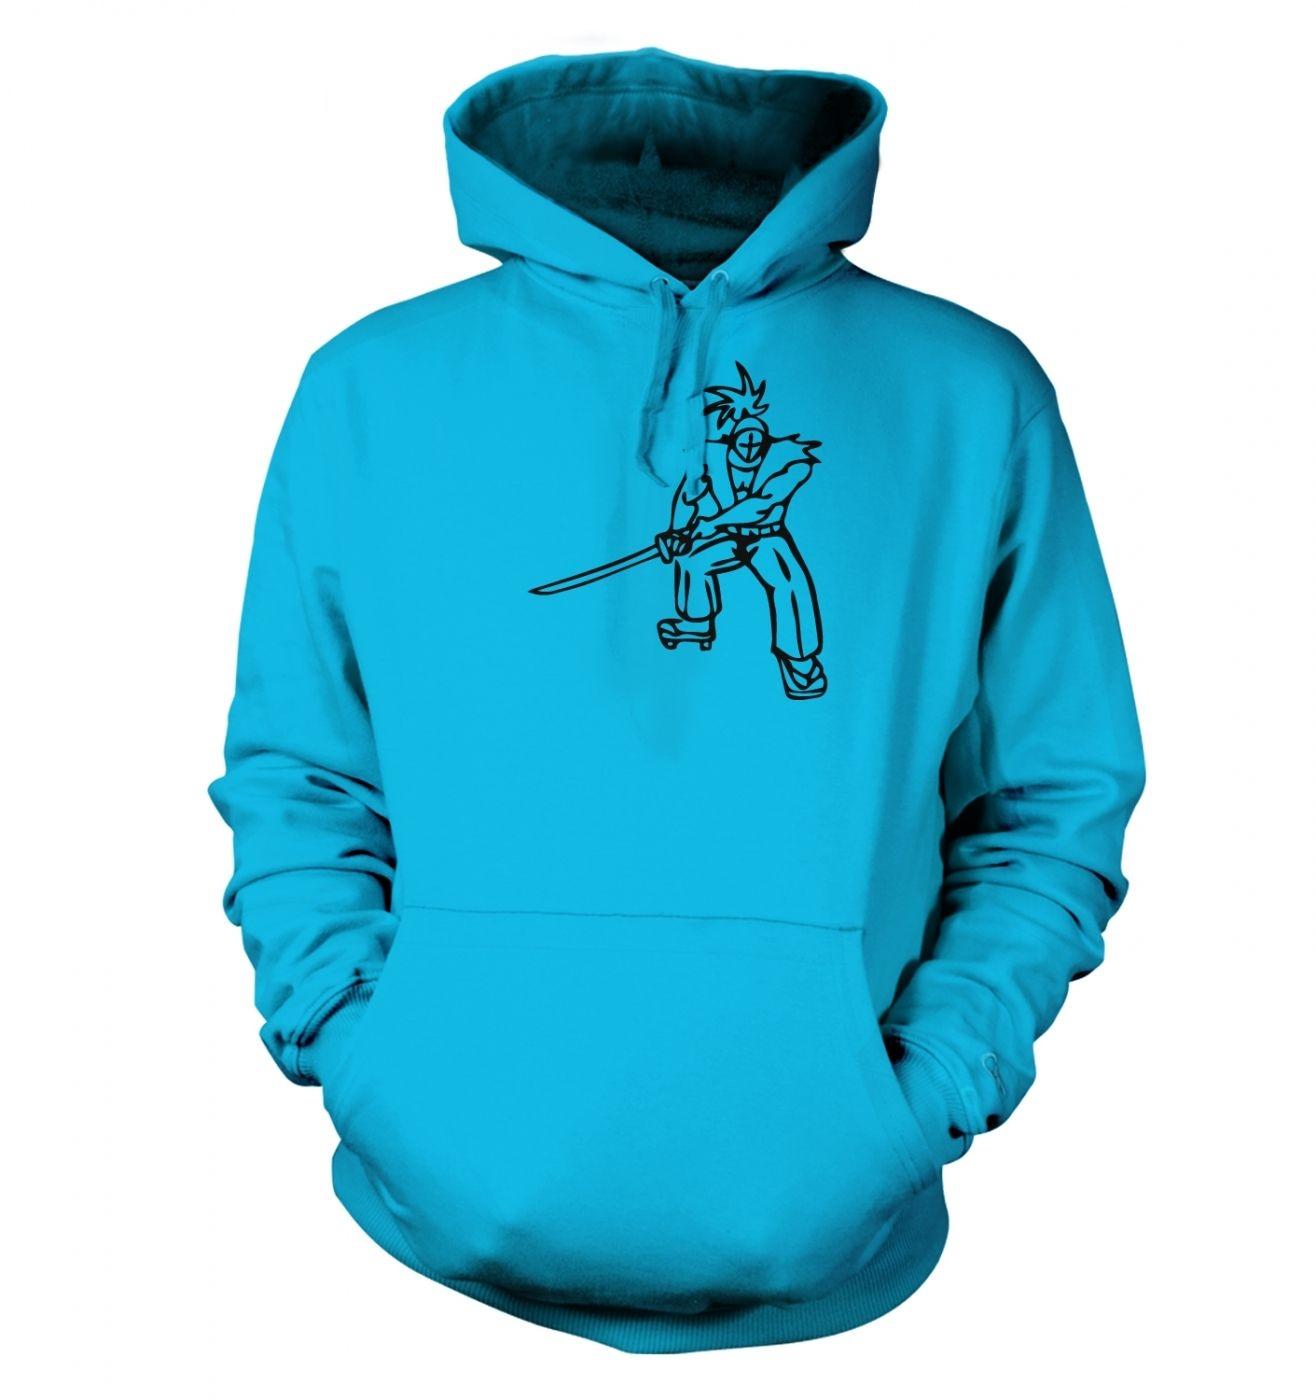 Samurai Ronin Japanese hoodie